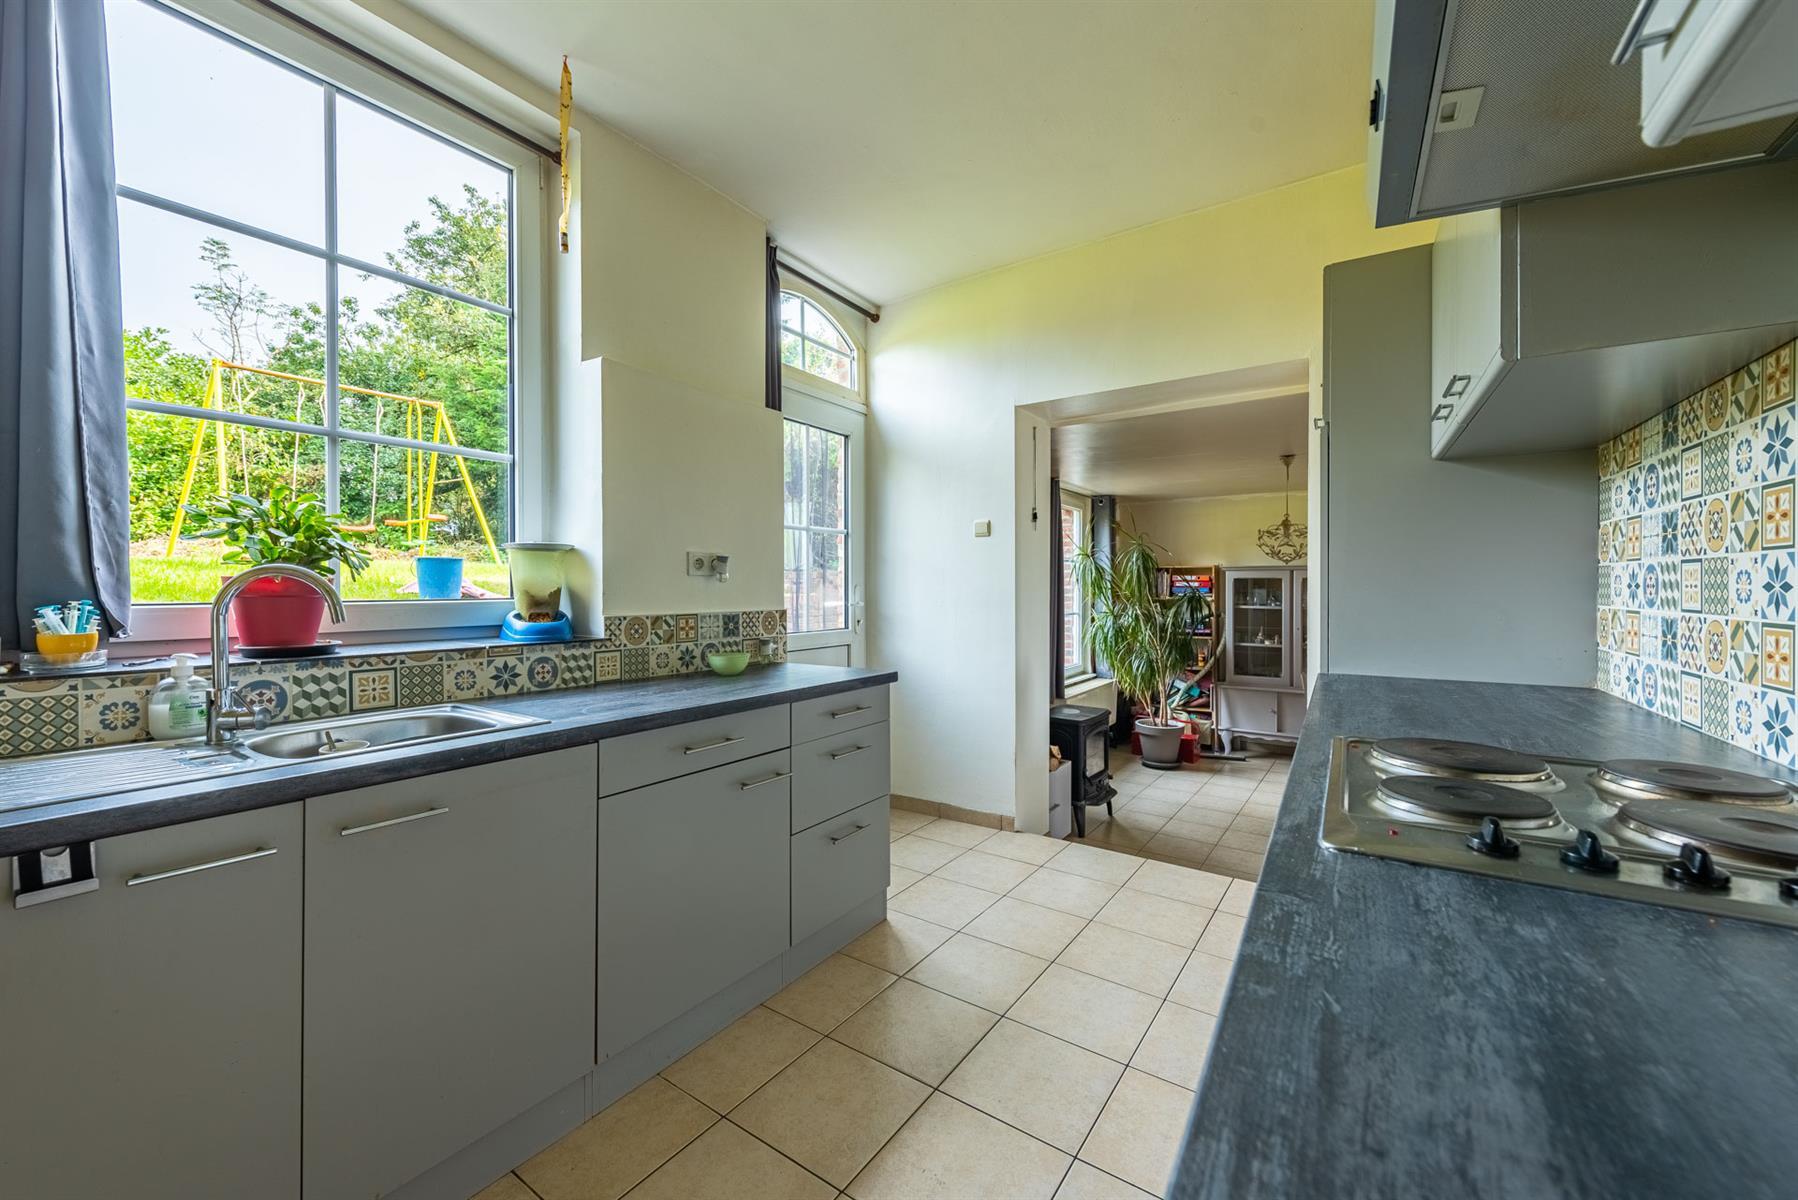 Maison - Houyet Wanlin - #4496629-8